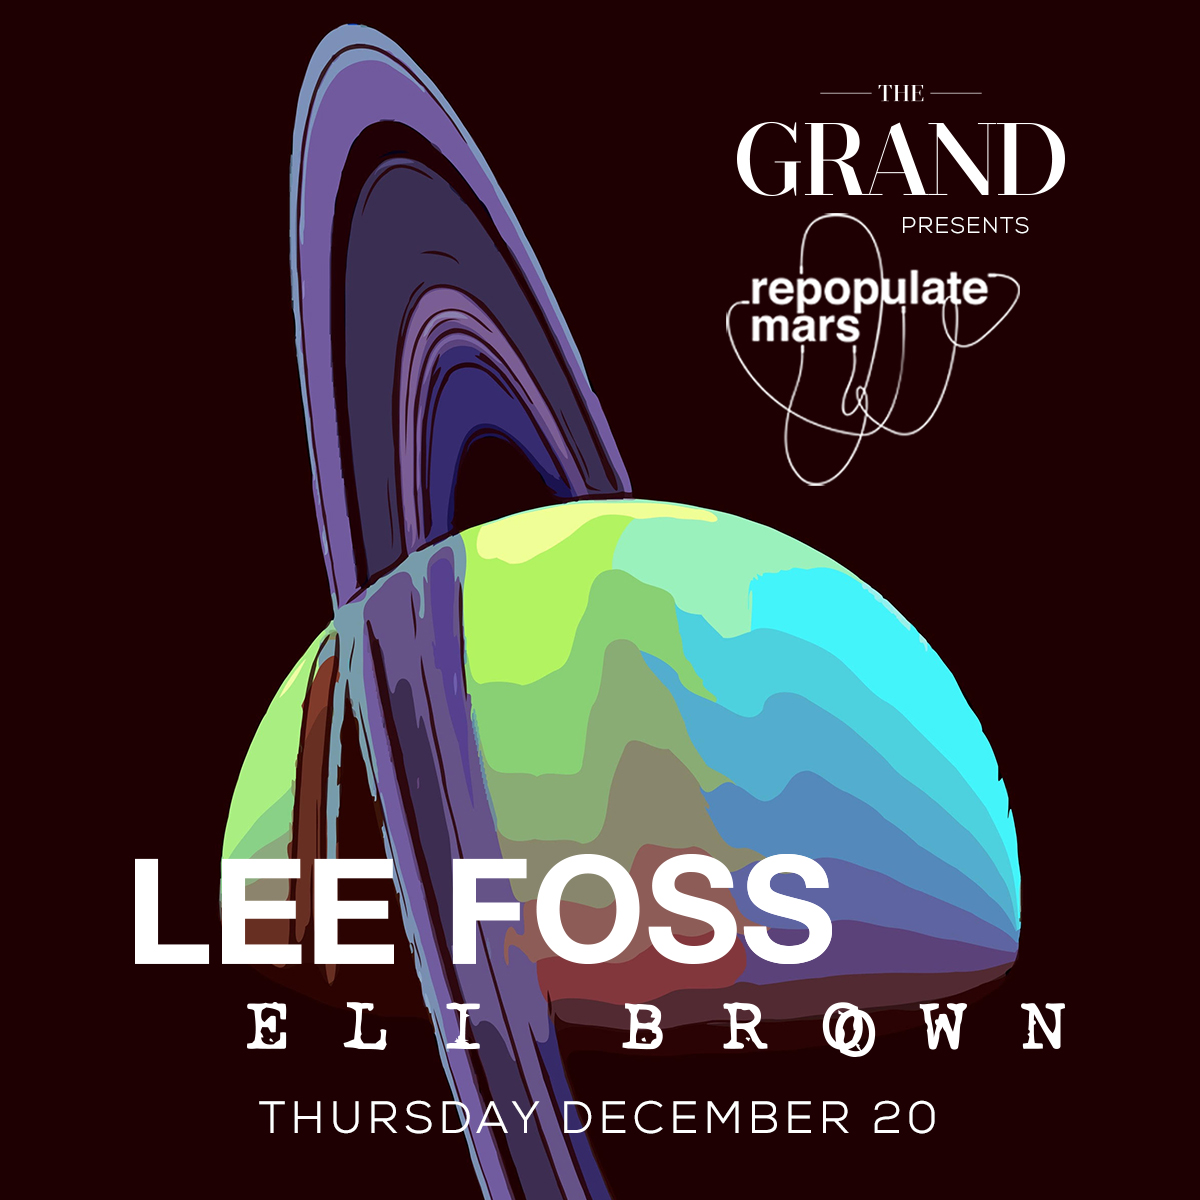 Tickets - The Grand Boston58 Seaport Blvd. Suite 300Boston, Massachusetts02210Lineup:Lee FossEli Brown